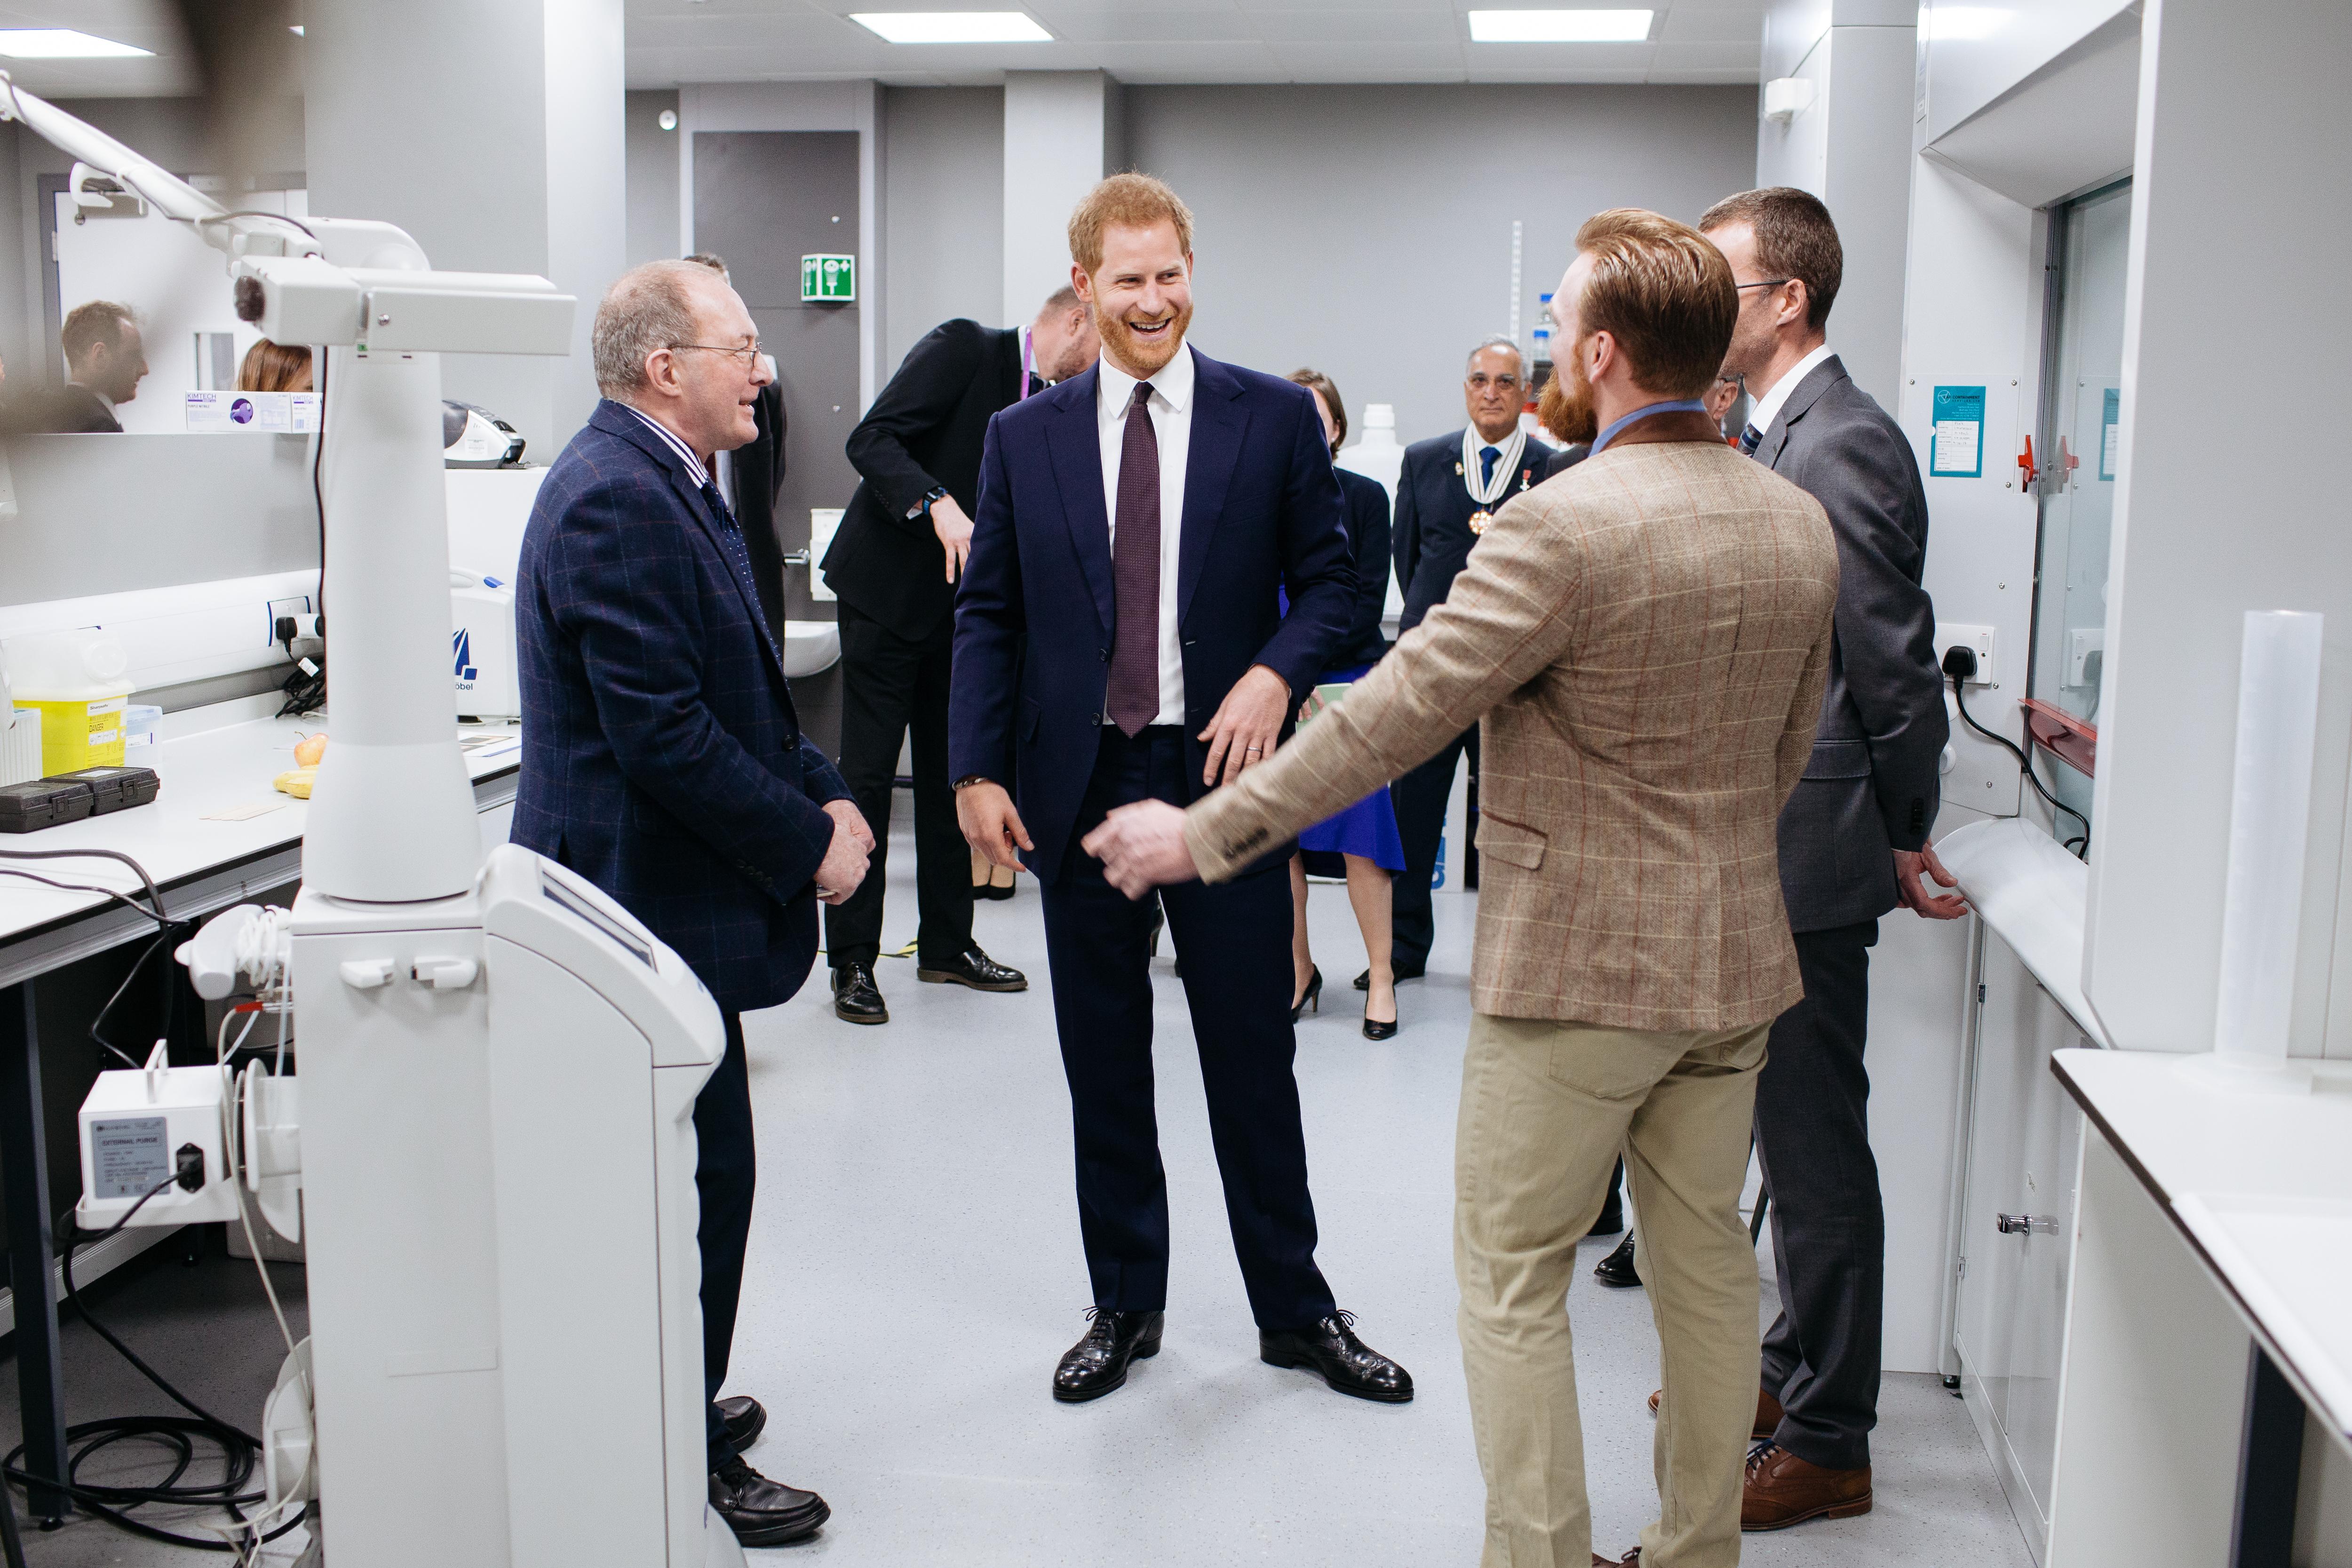 HRH Prince Harry, The Duke of Sussex visits The Queen Elizabeth Hospital in Birmingham Scar Center